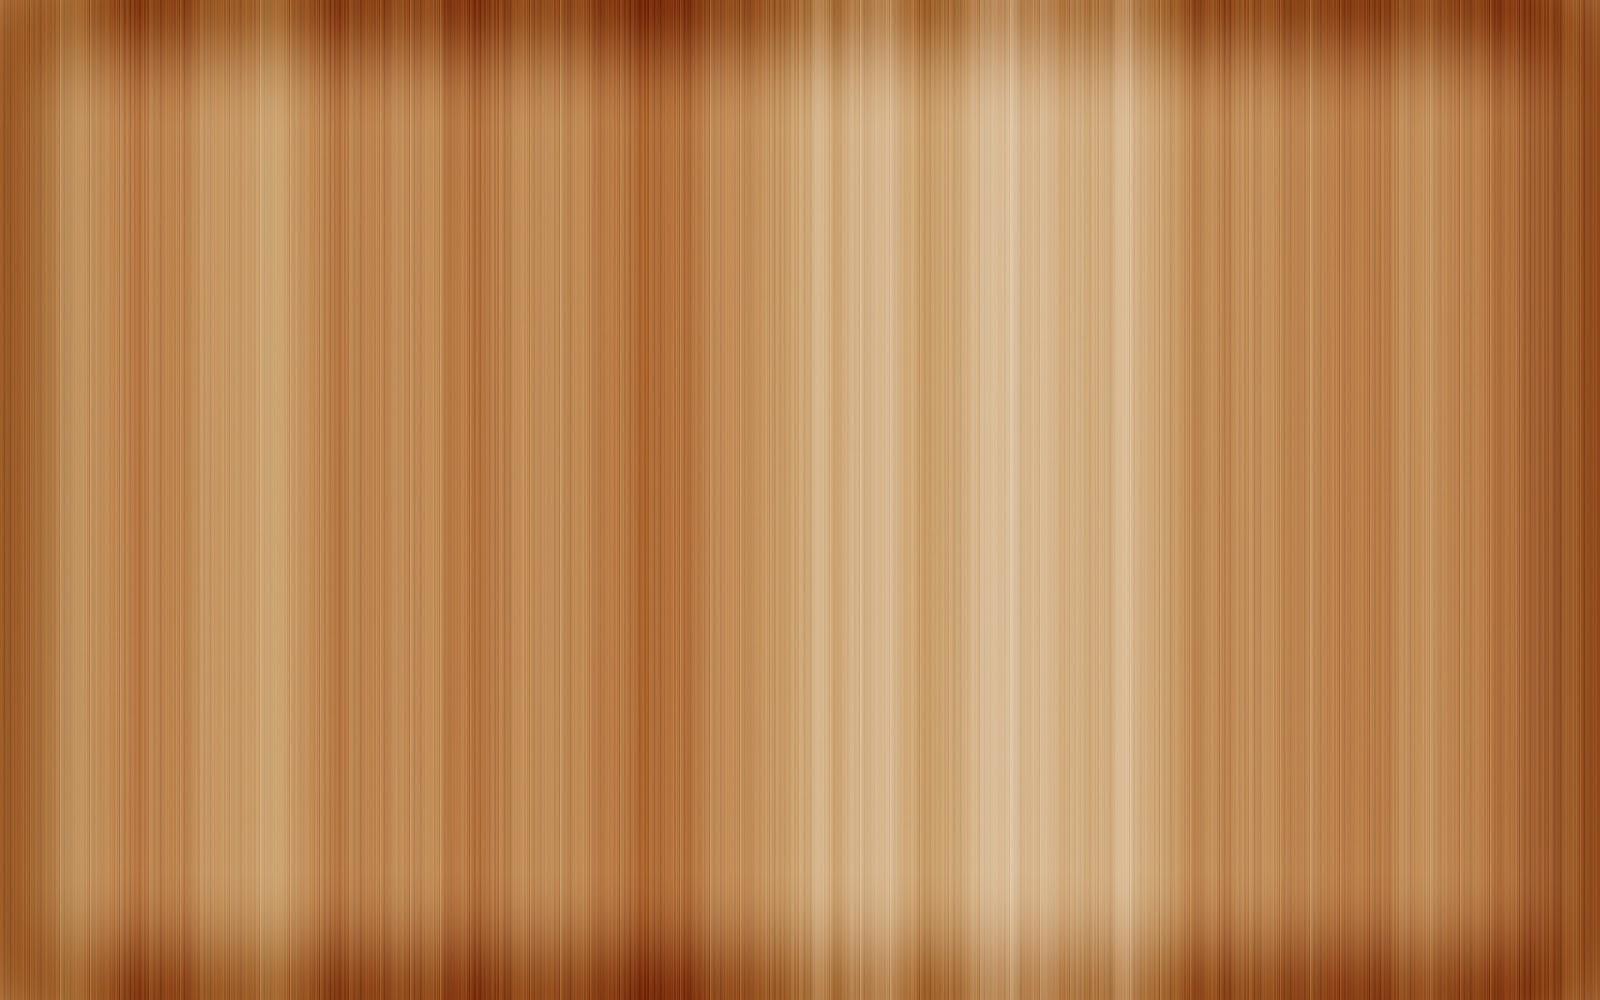 wallpaper wood 2 - photo #24